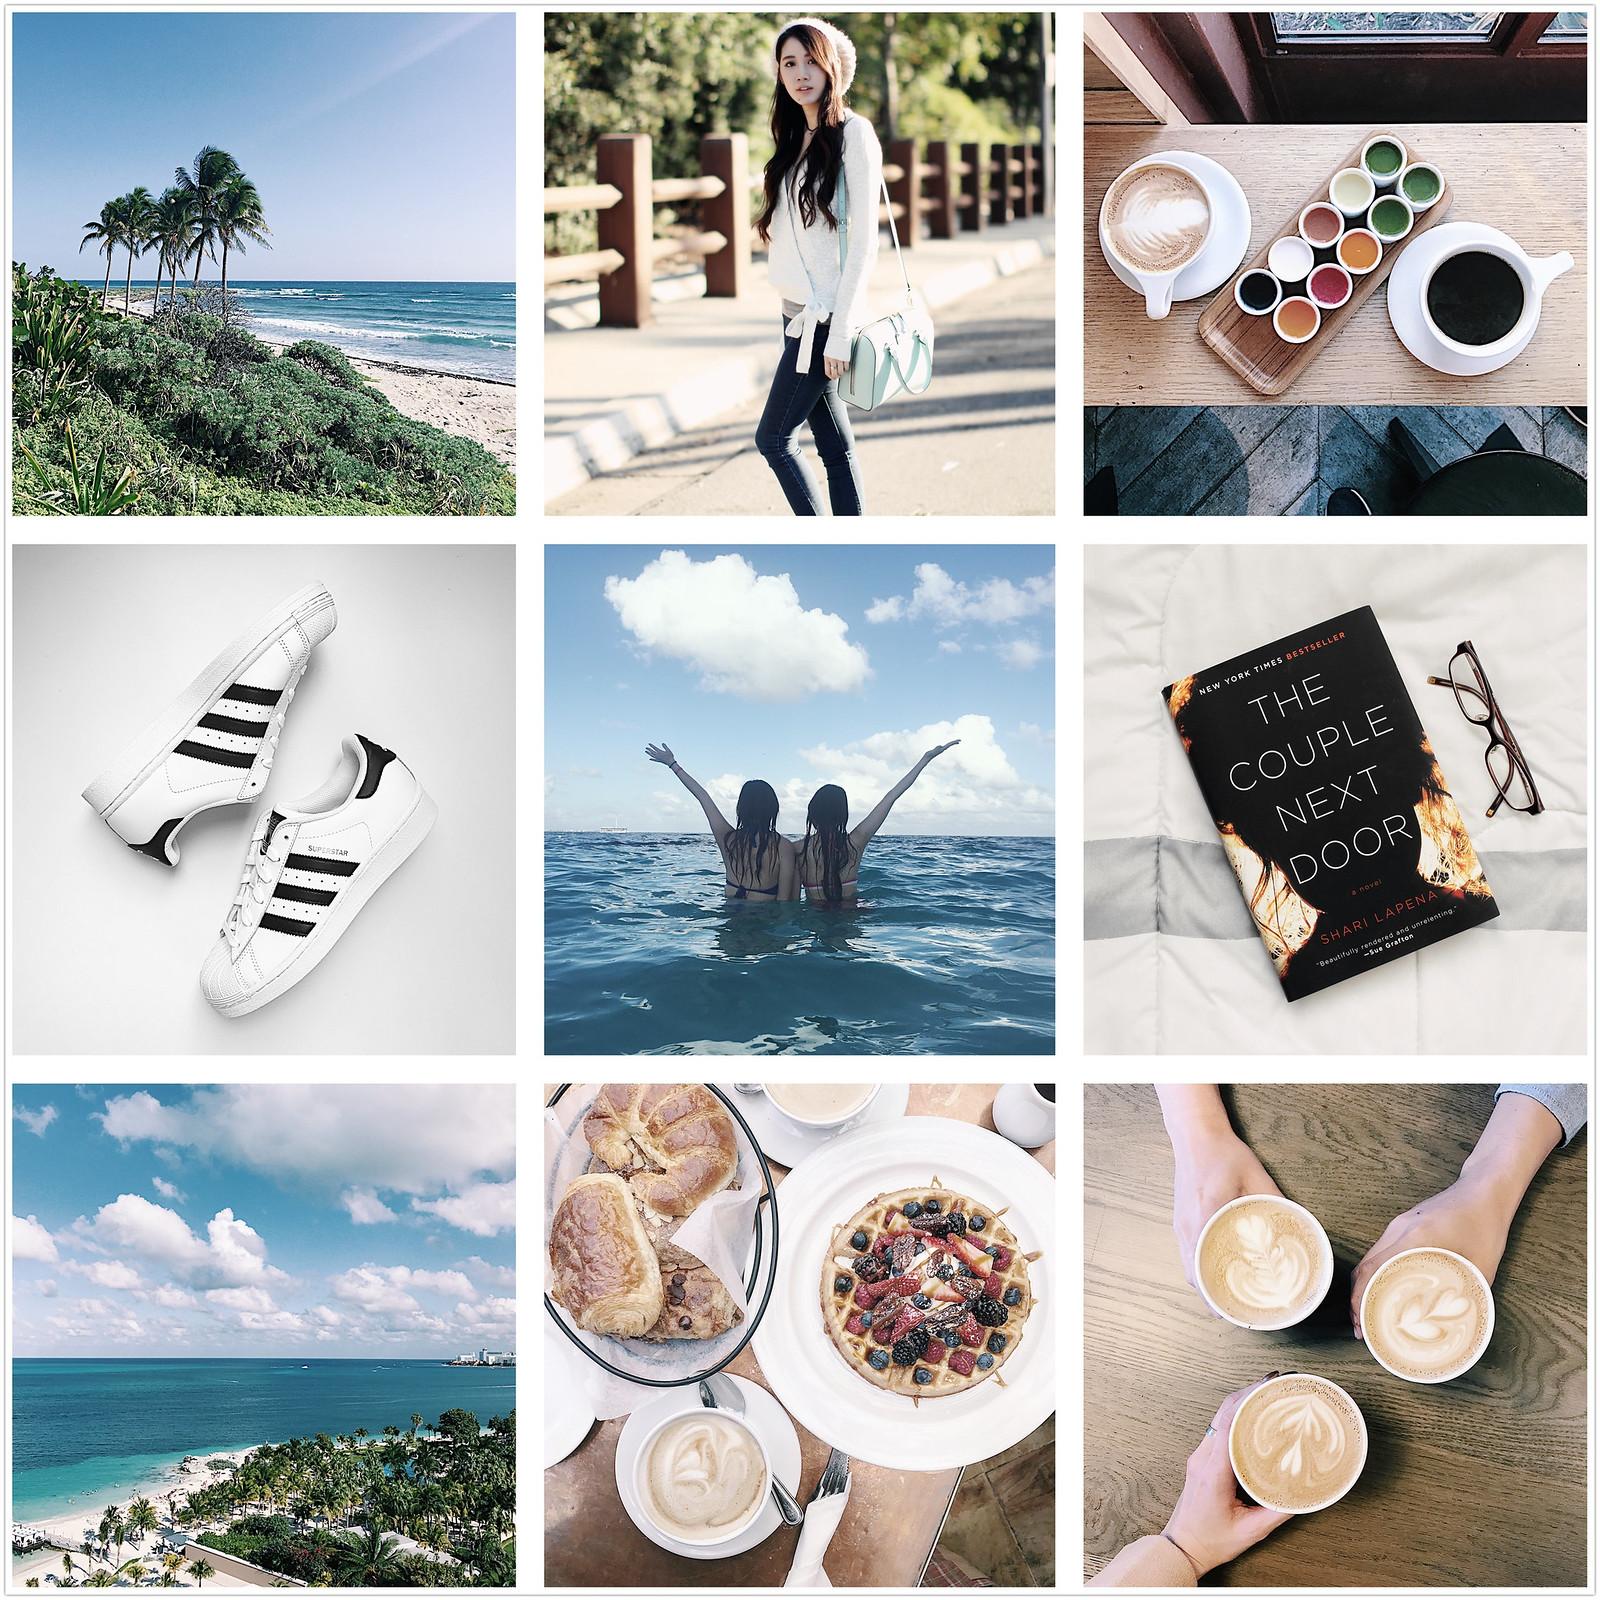 clothestoyouuu-elizabeeetht-instagram-ootd-fashion-flatlays-foodie-lifestyle-hipster-dtla-lastory